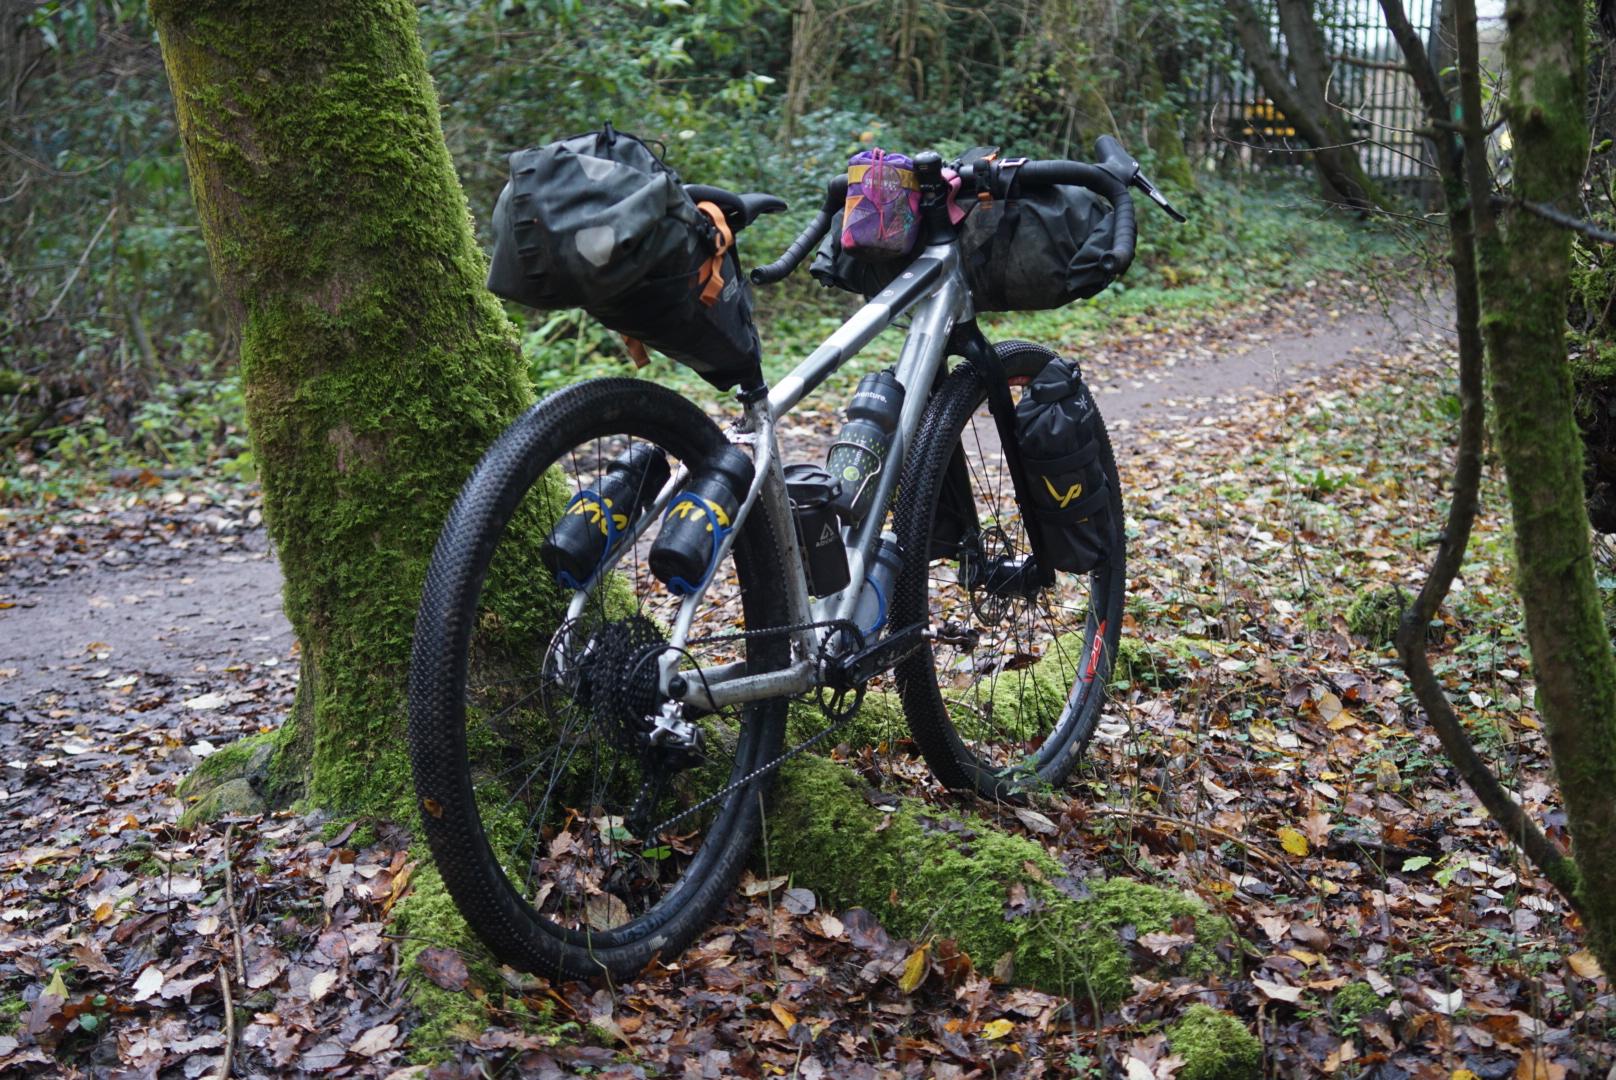 Riverside 920 Touring Trekking Bikepacking Decathlon Cheap Budget